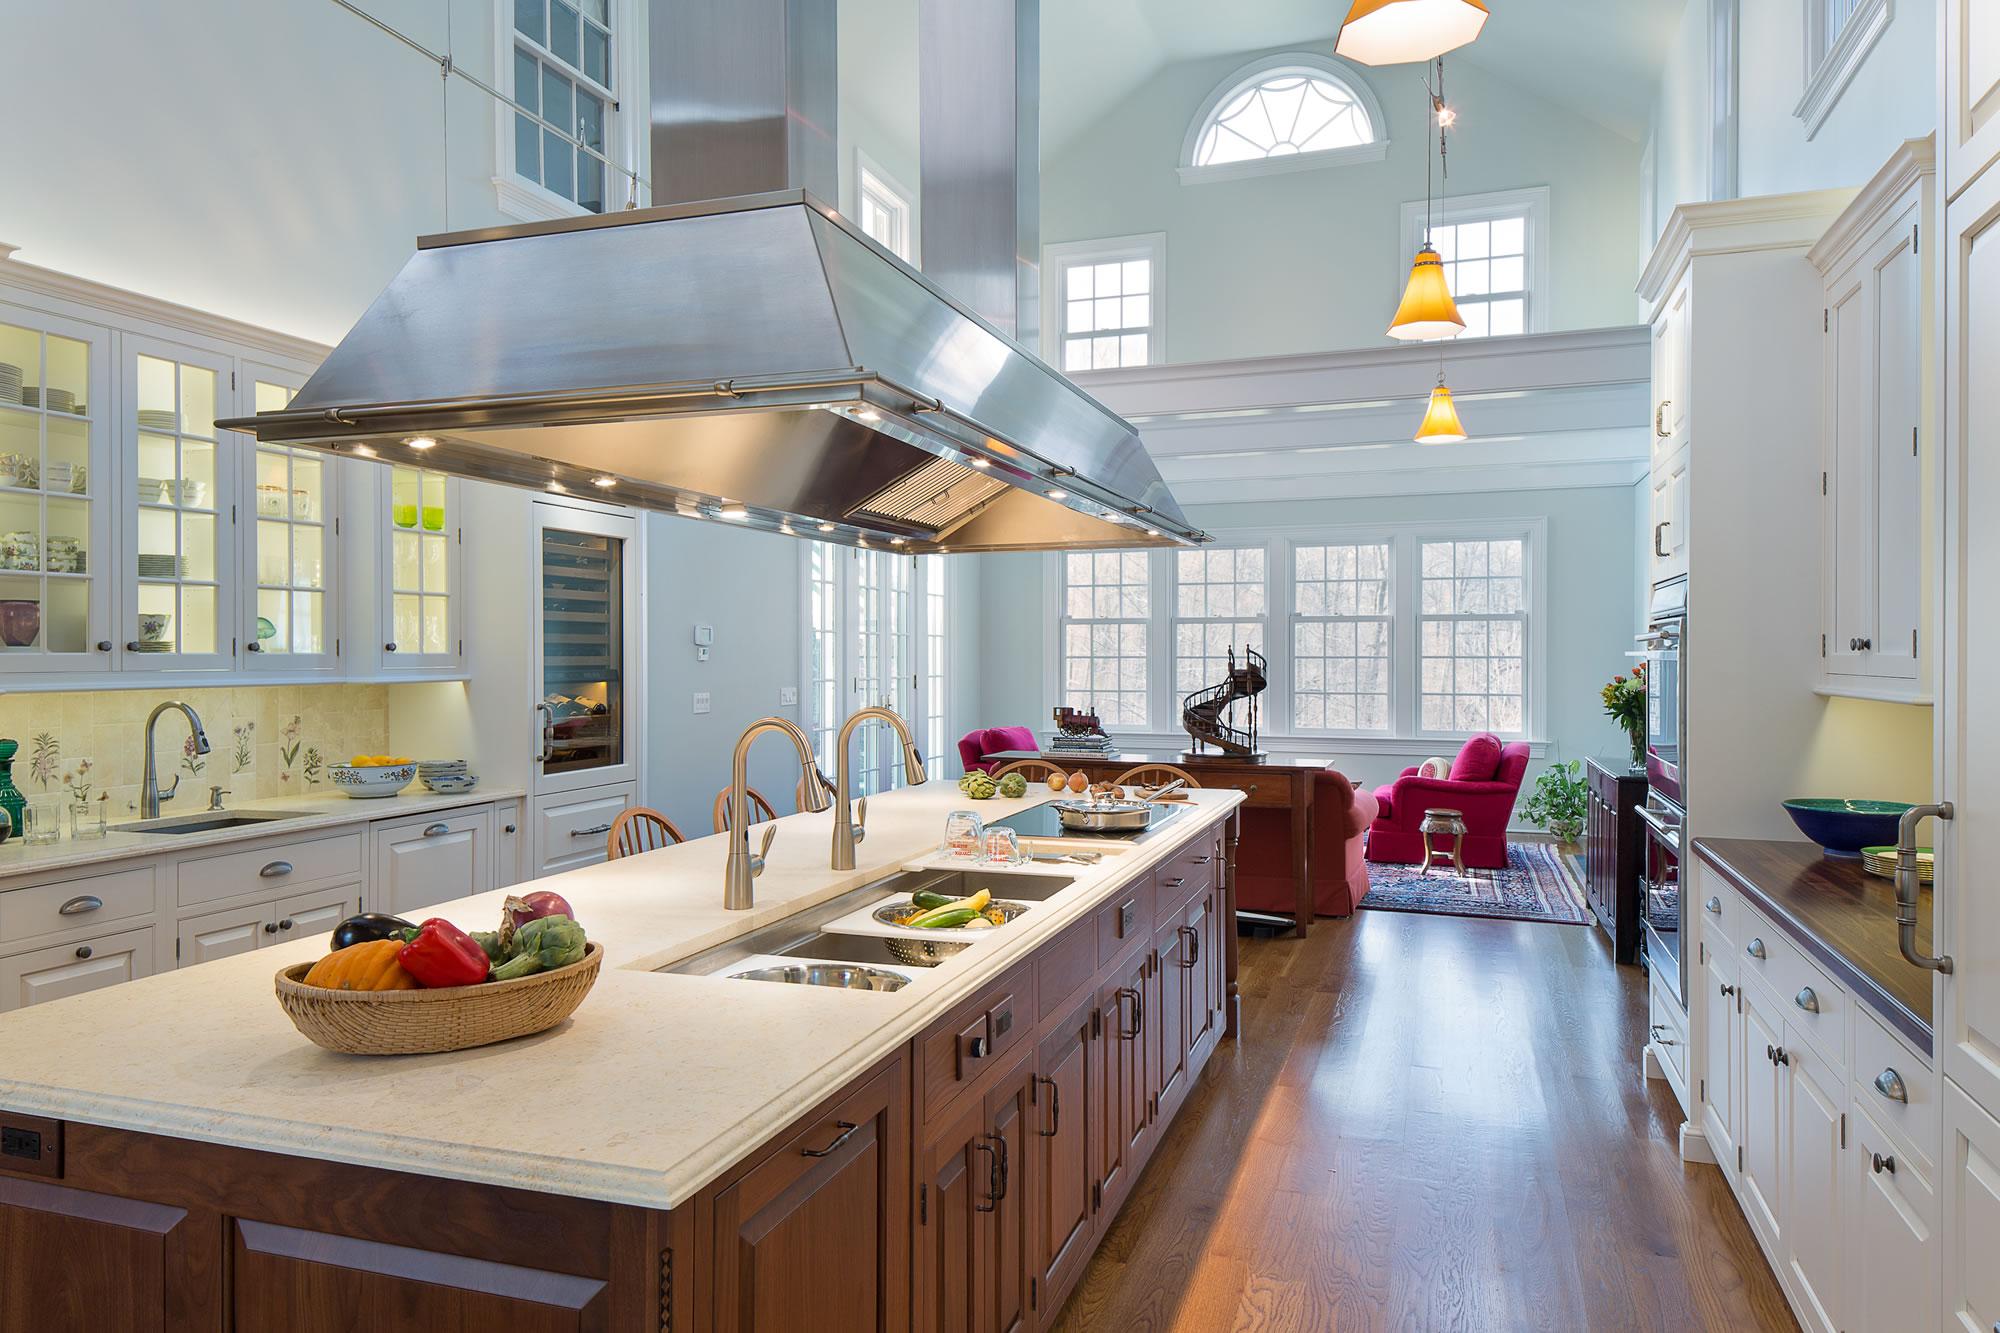 designsforlivingvt kitchen remodel ct Lofty Connecticut Kitchen Remodel embraces natural light works for family